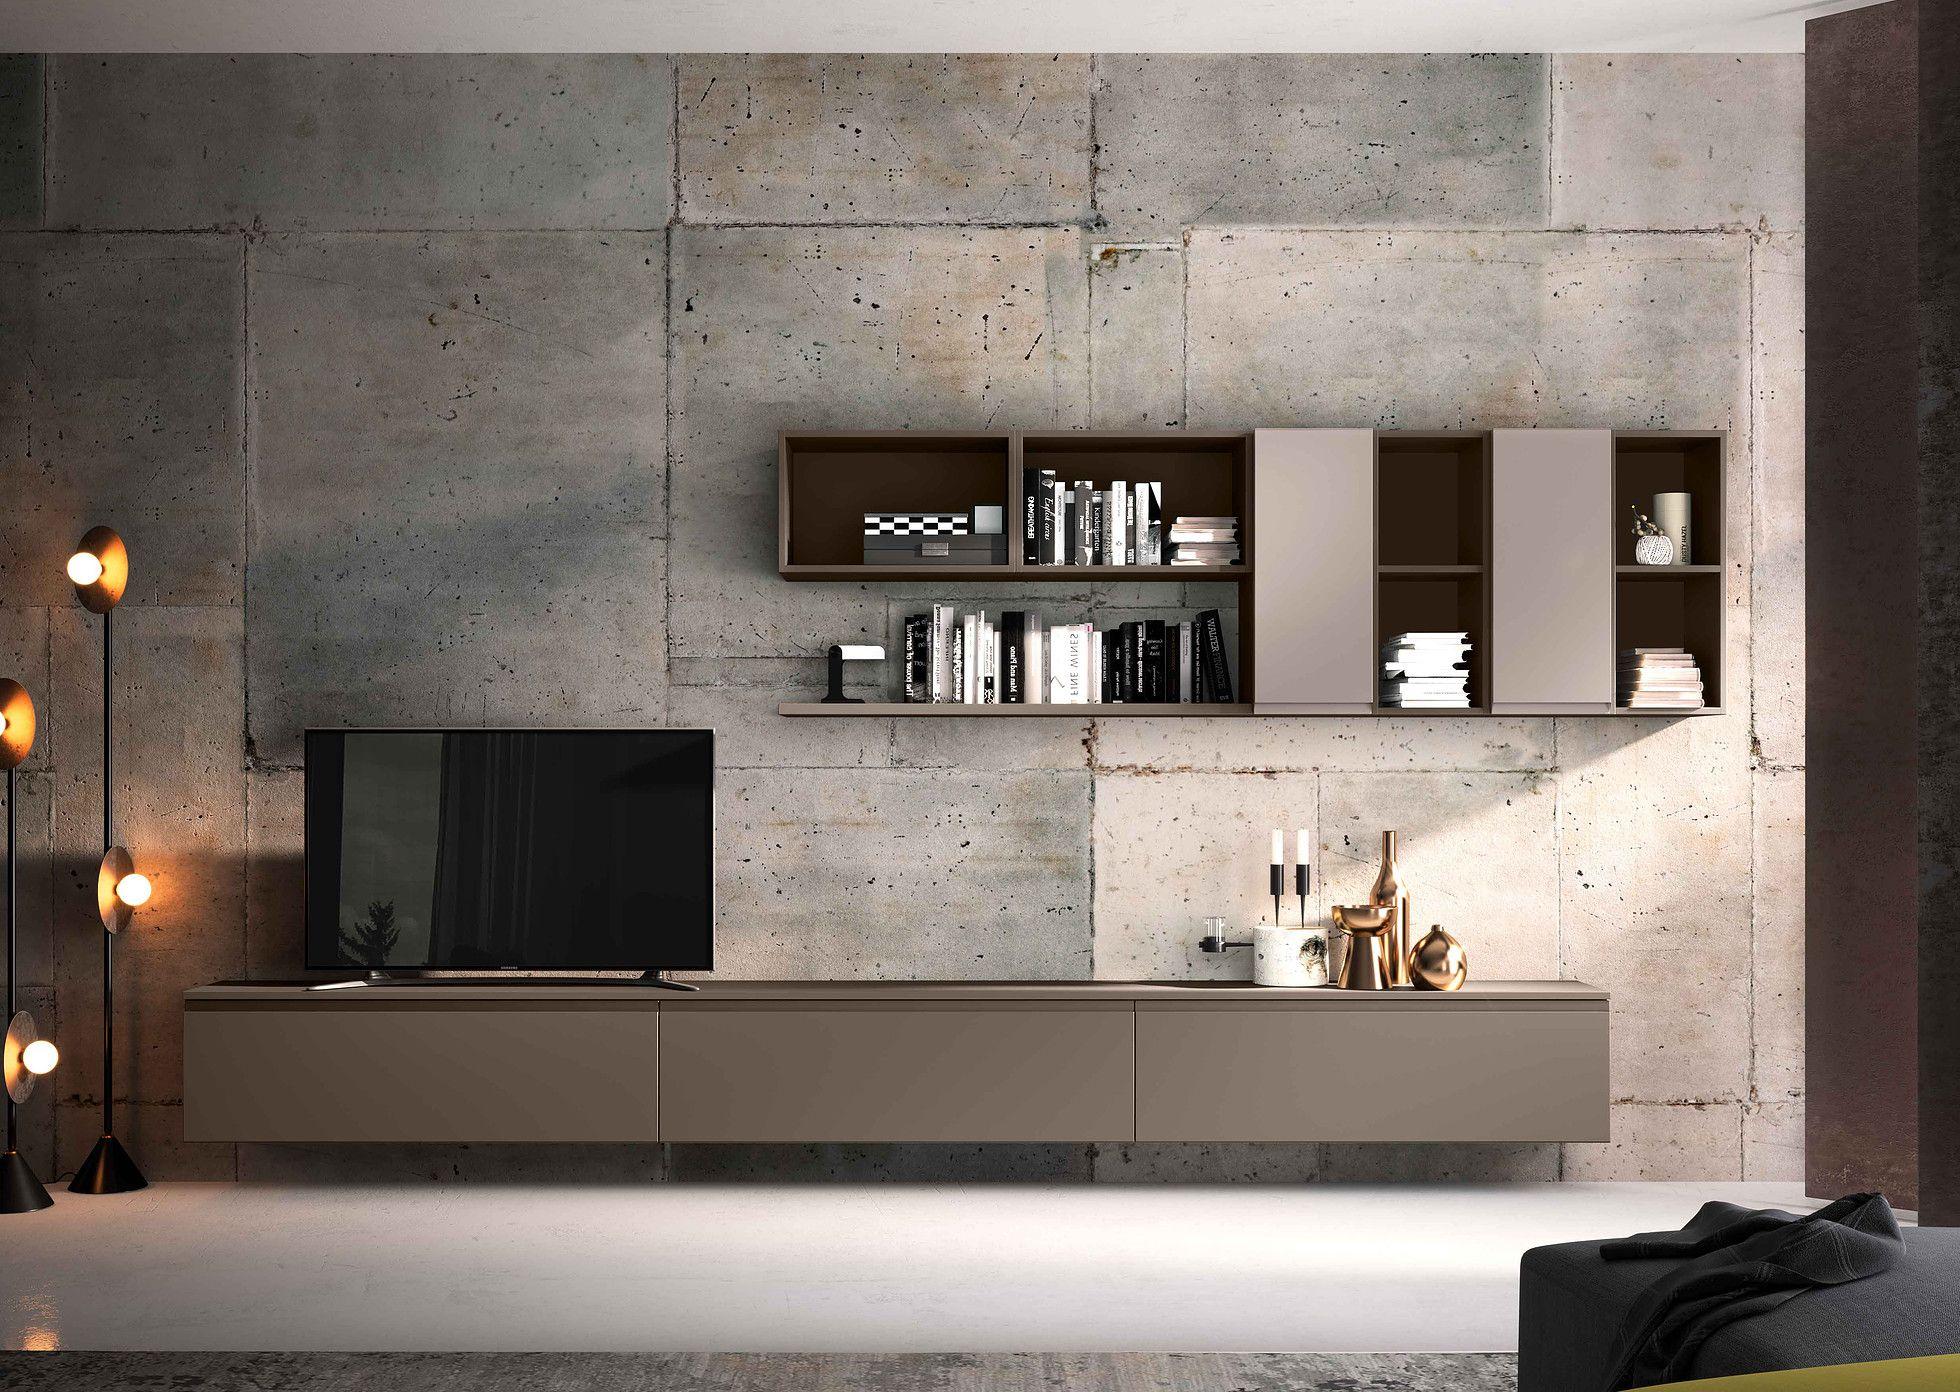 Ala Cucine Sito Ufficiale Time Plus Cucine Moderne Arredamento Case